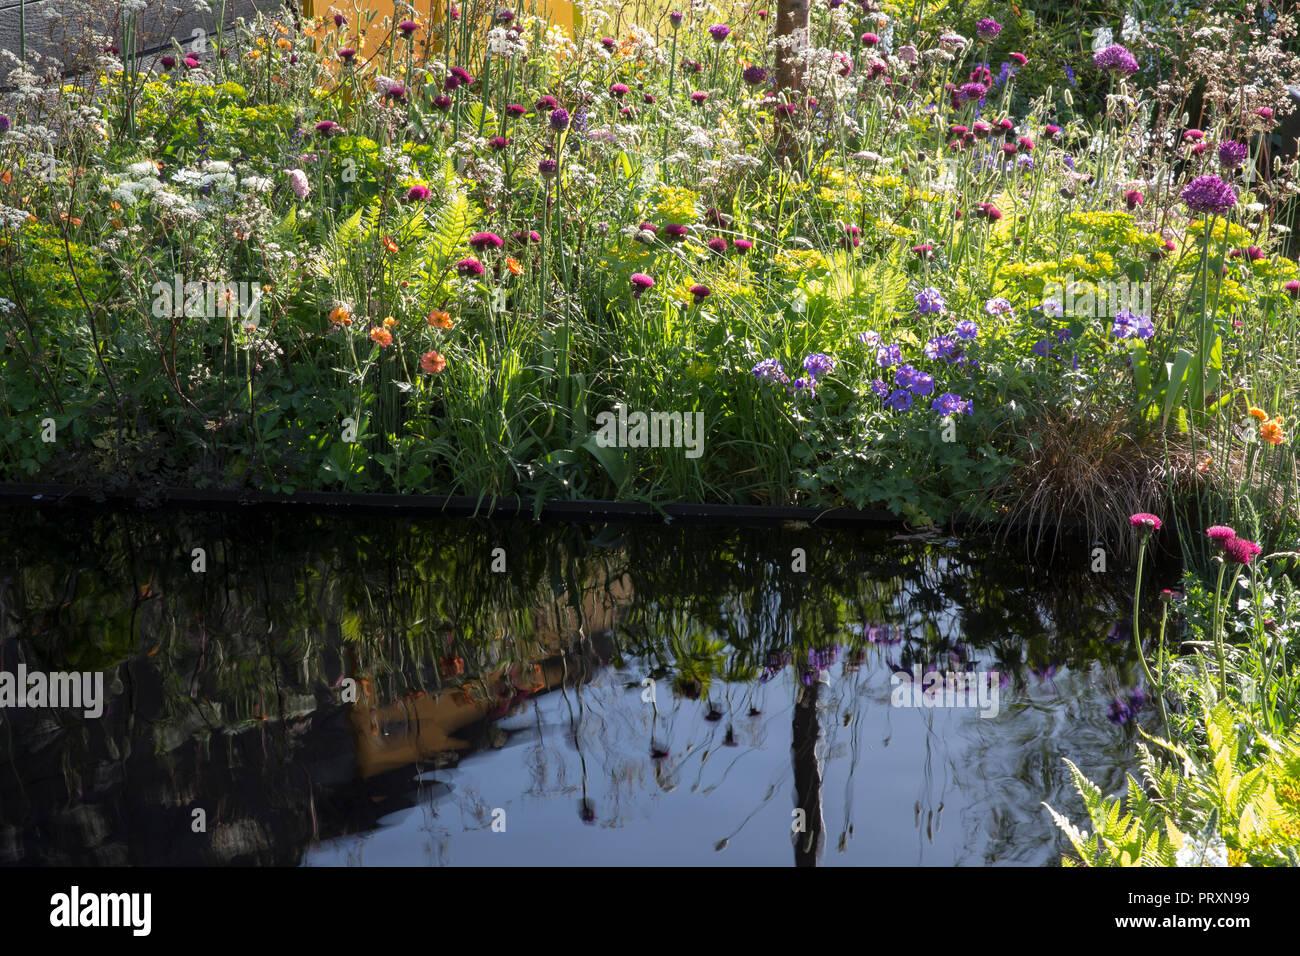 Dark reflective pool, meadow style planting of Allium hollandicum 'Purple Sensation', Cirsium rivulare 'Atropurpureum', Geum 'Totally Tangerine', Myrr - Stock Image